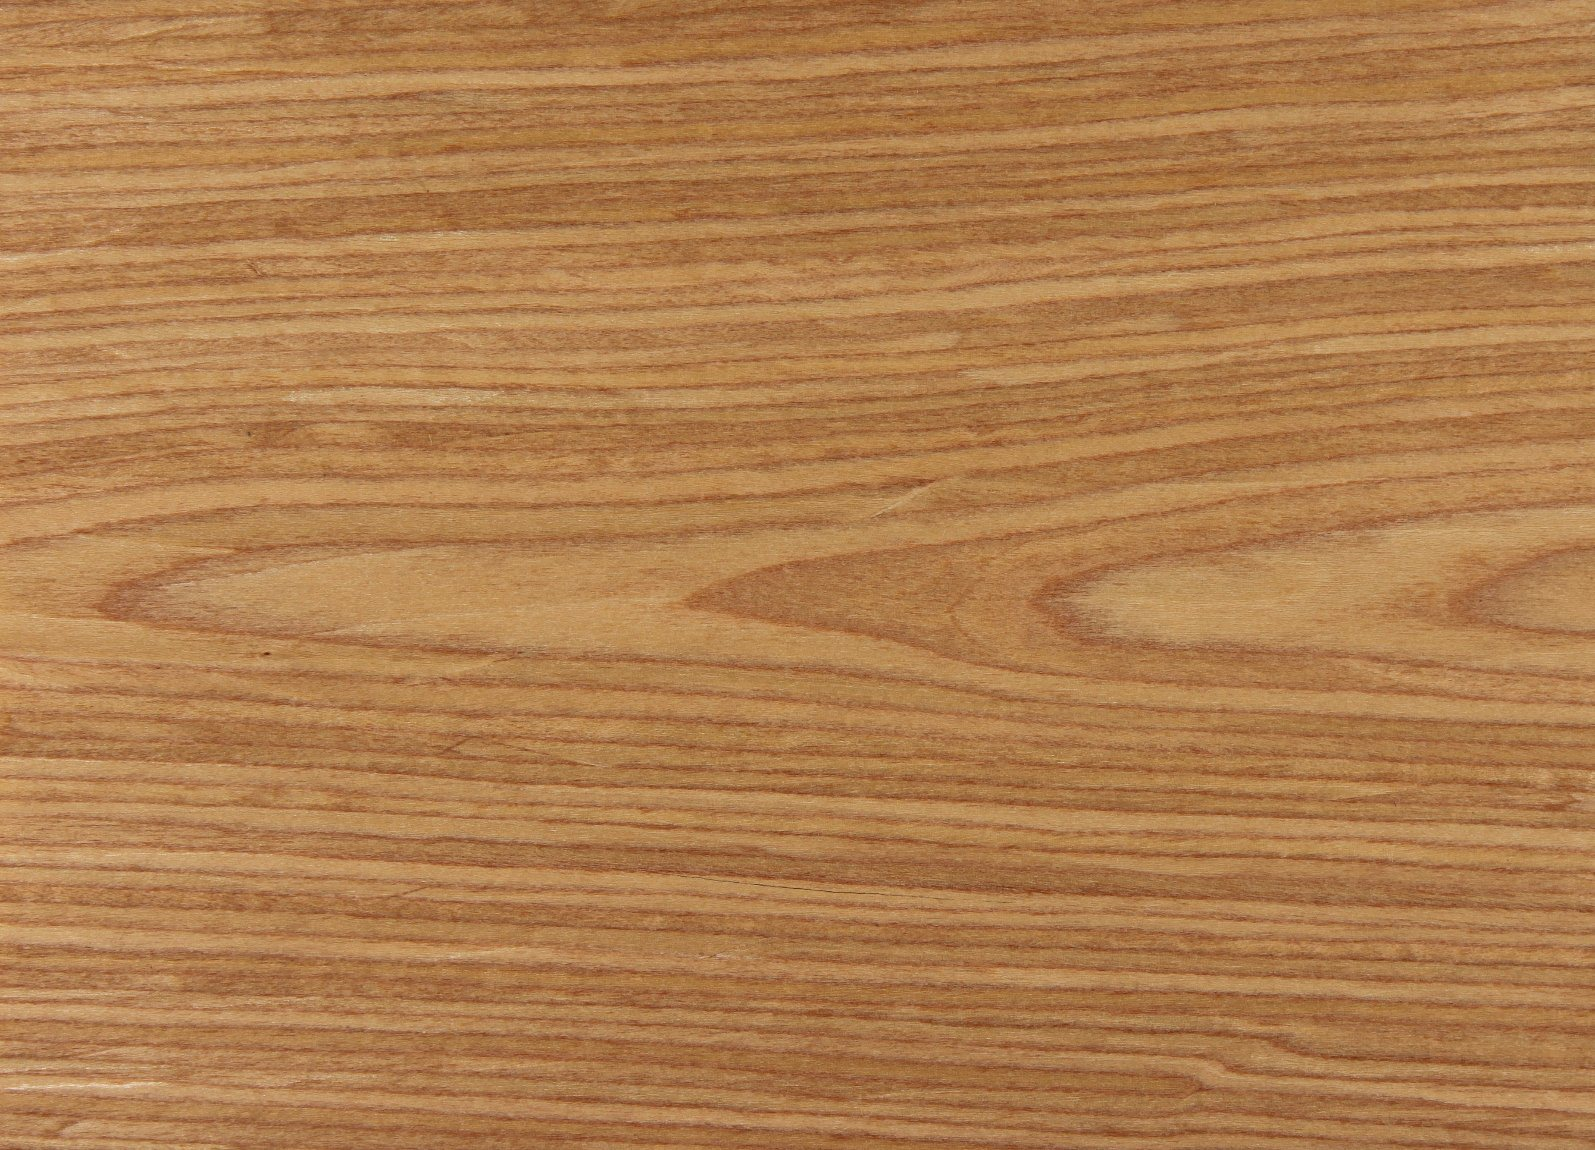 China hot sale engineered wood veneer cherry 638c for decoration and furniture china furniture veneer kitchen cabinet veneer